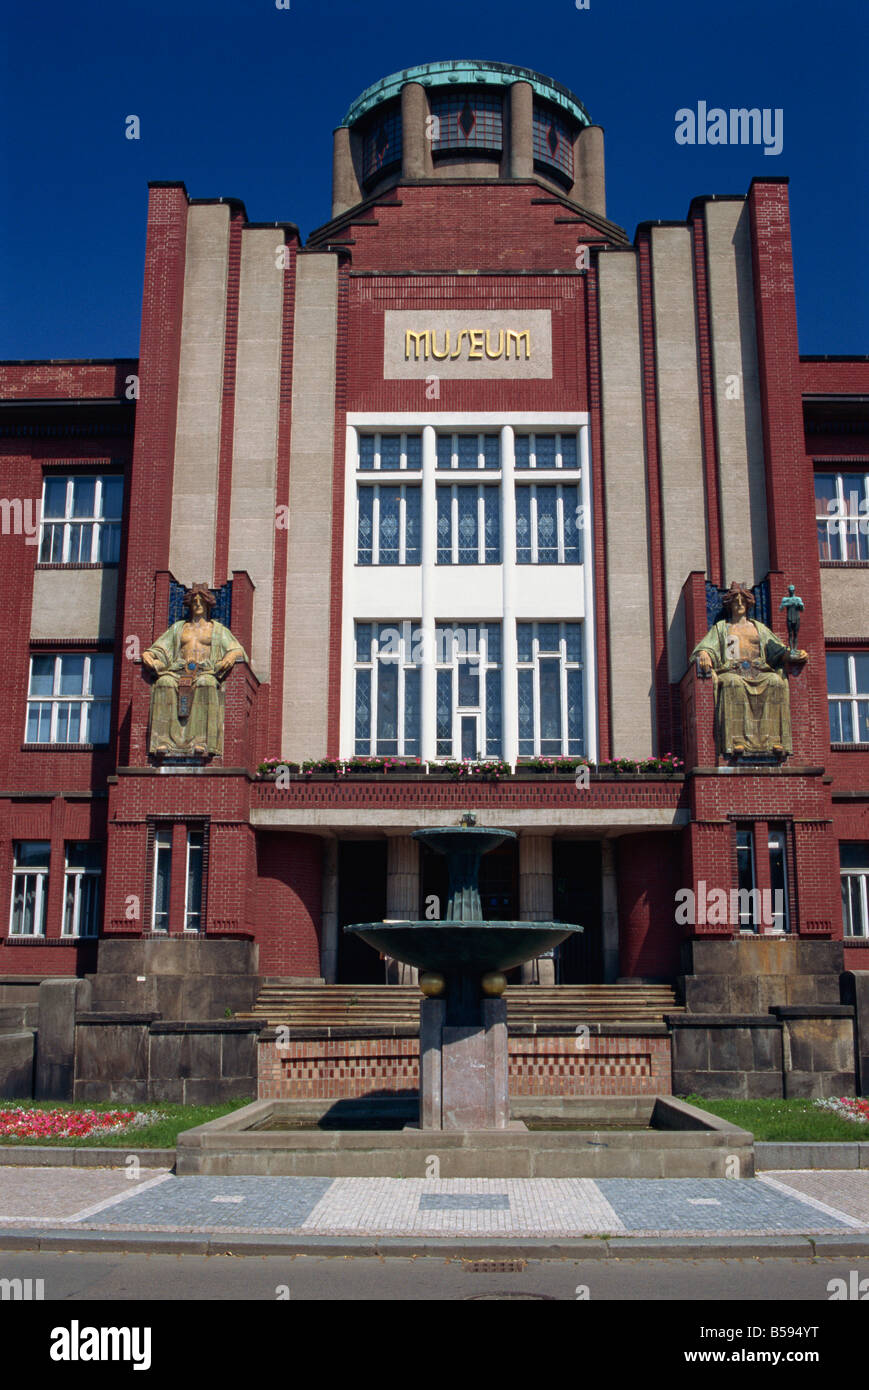 Museum by Jan Kotera, Hradec Kralove, East Bohemia, Czech Republic, Europe Stock Photo